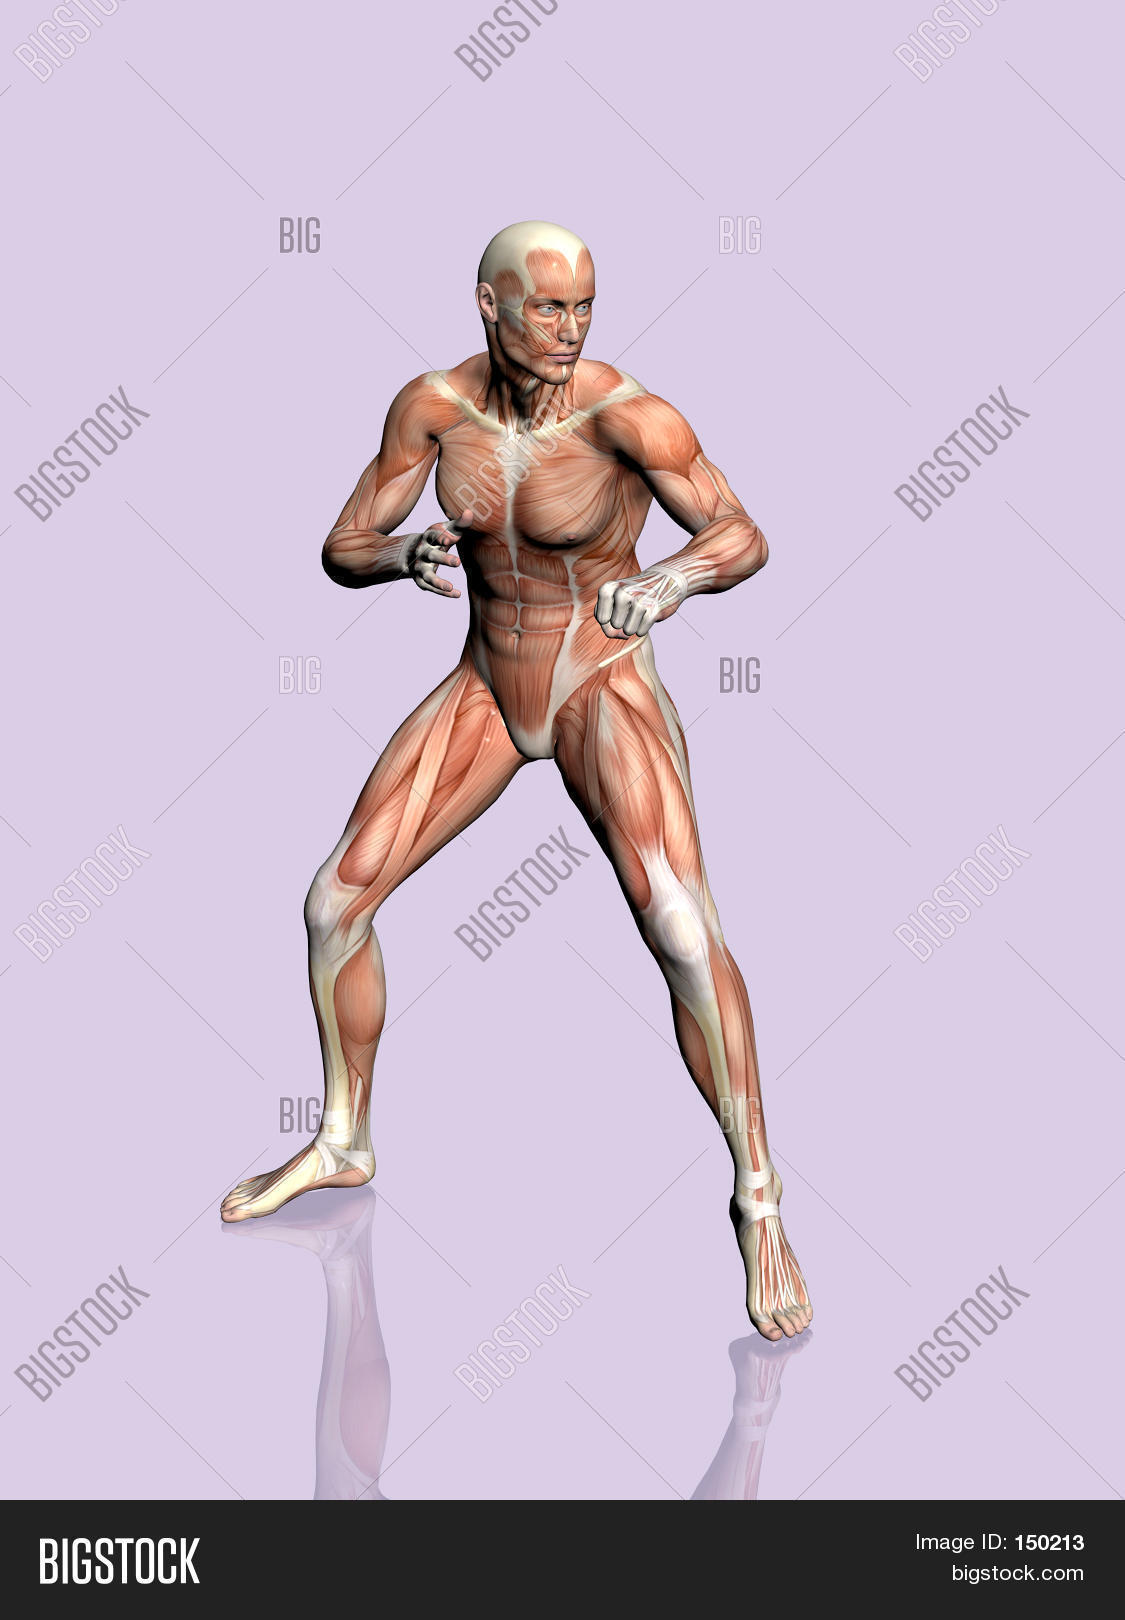 Anatomy Man Image Photo Free Trial Bigstock